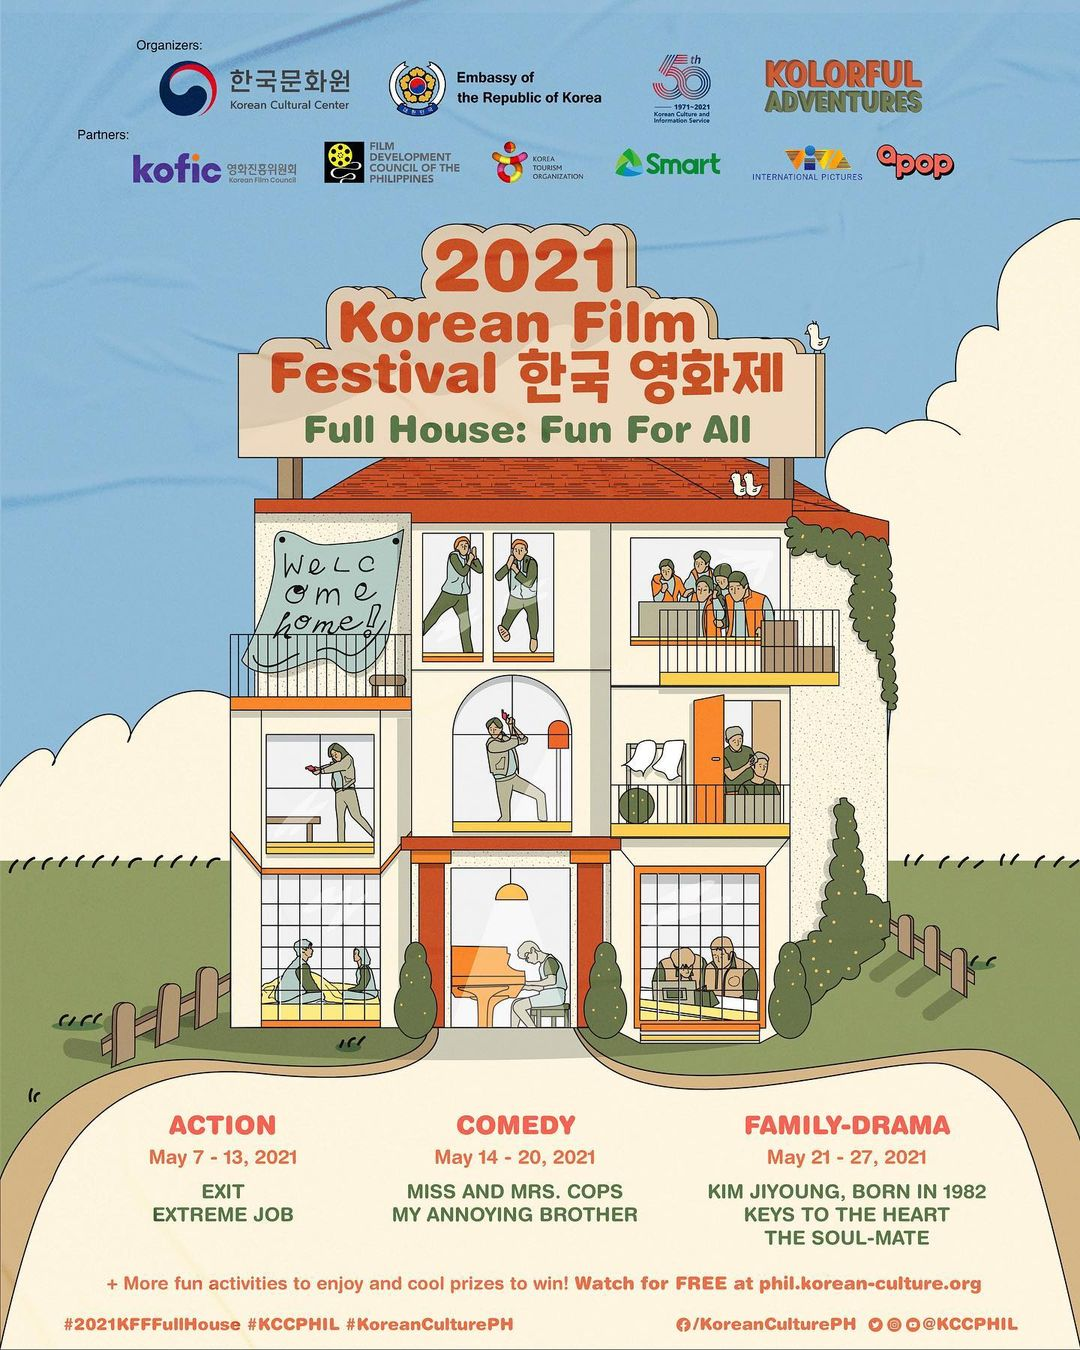 Korean Film Festival 2021: List Of Movies